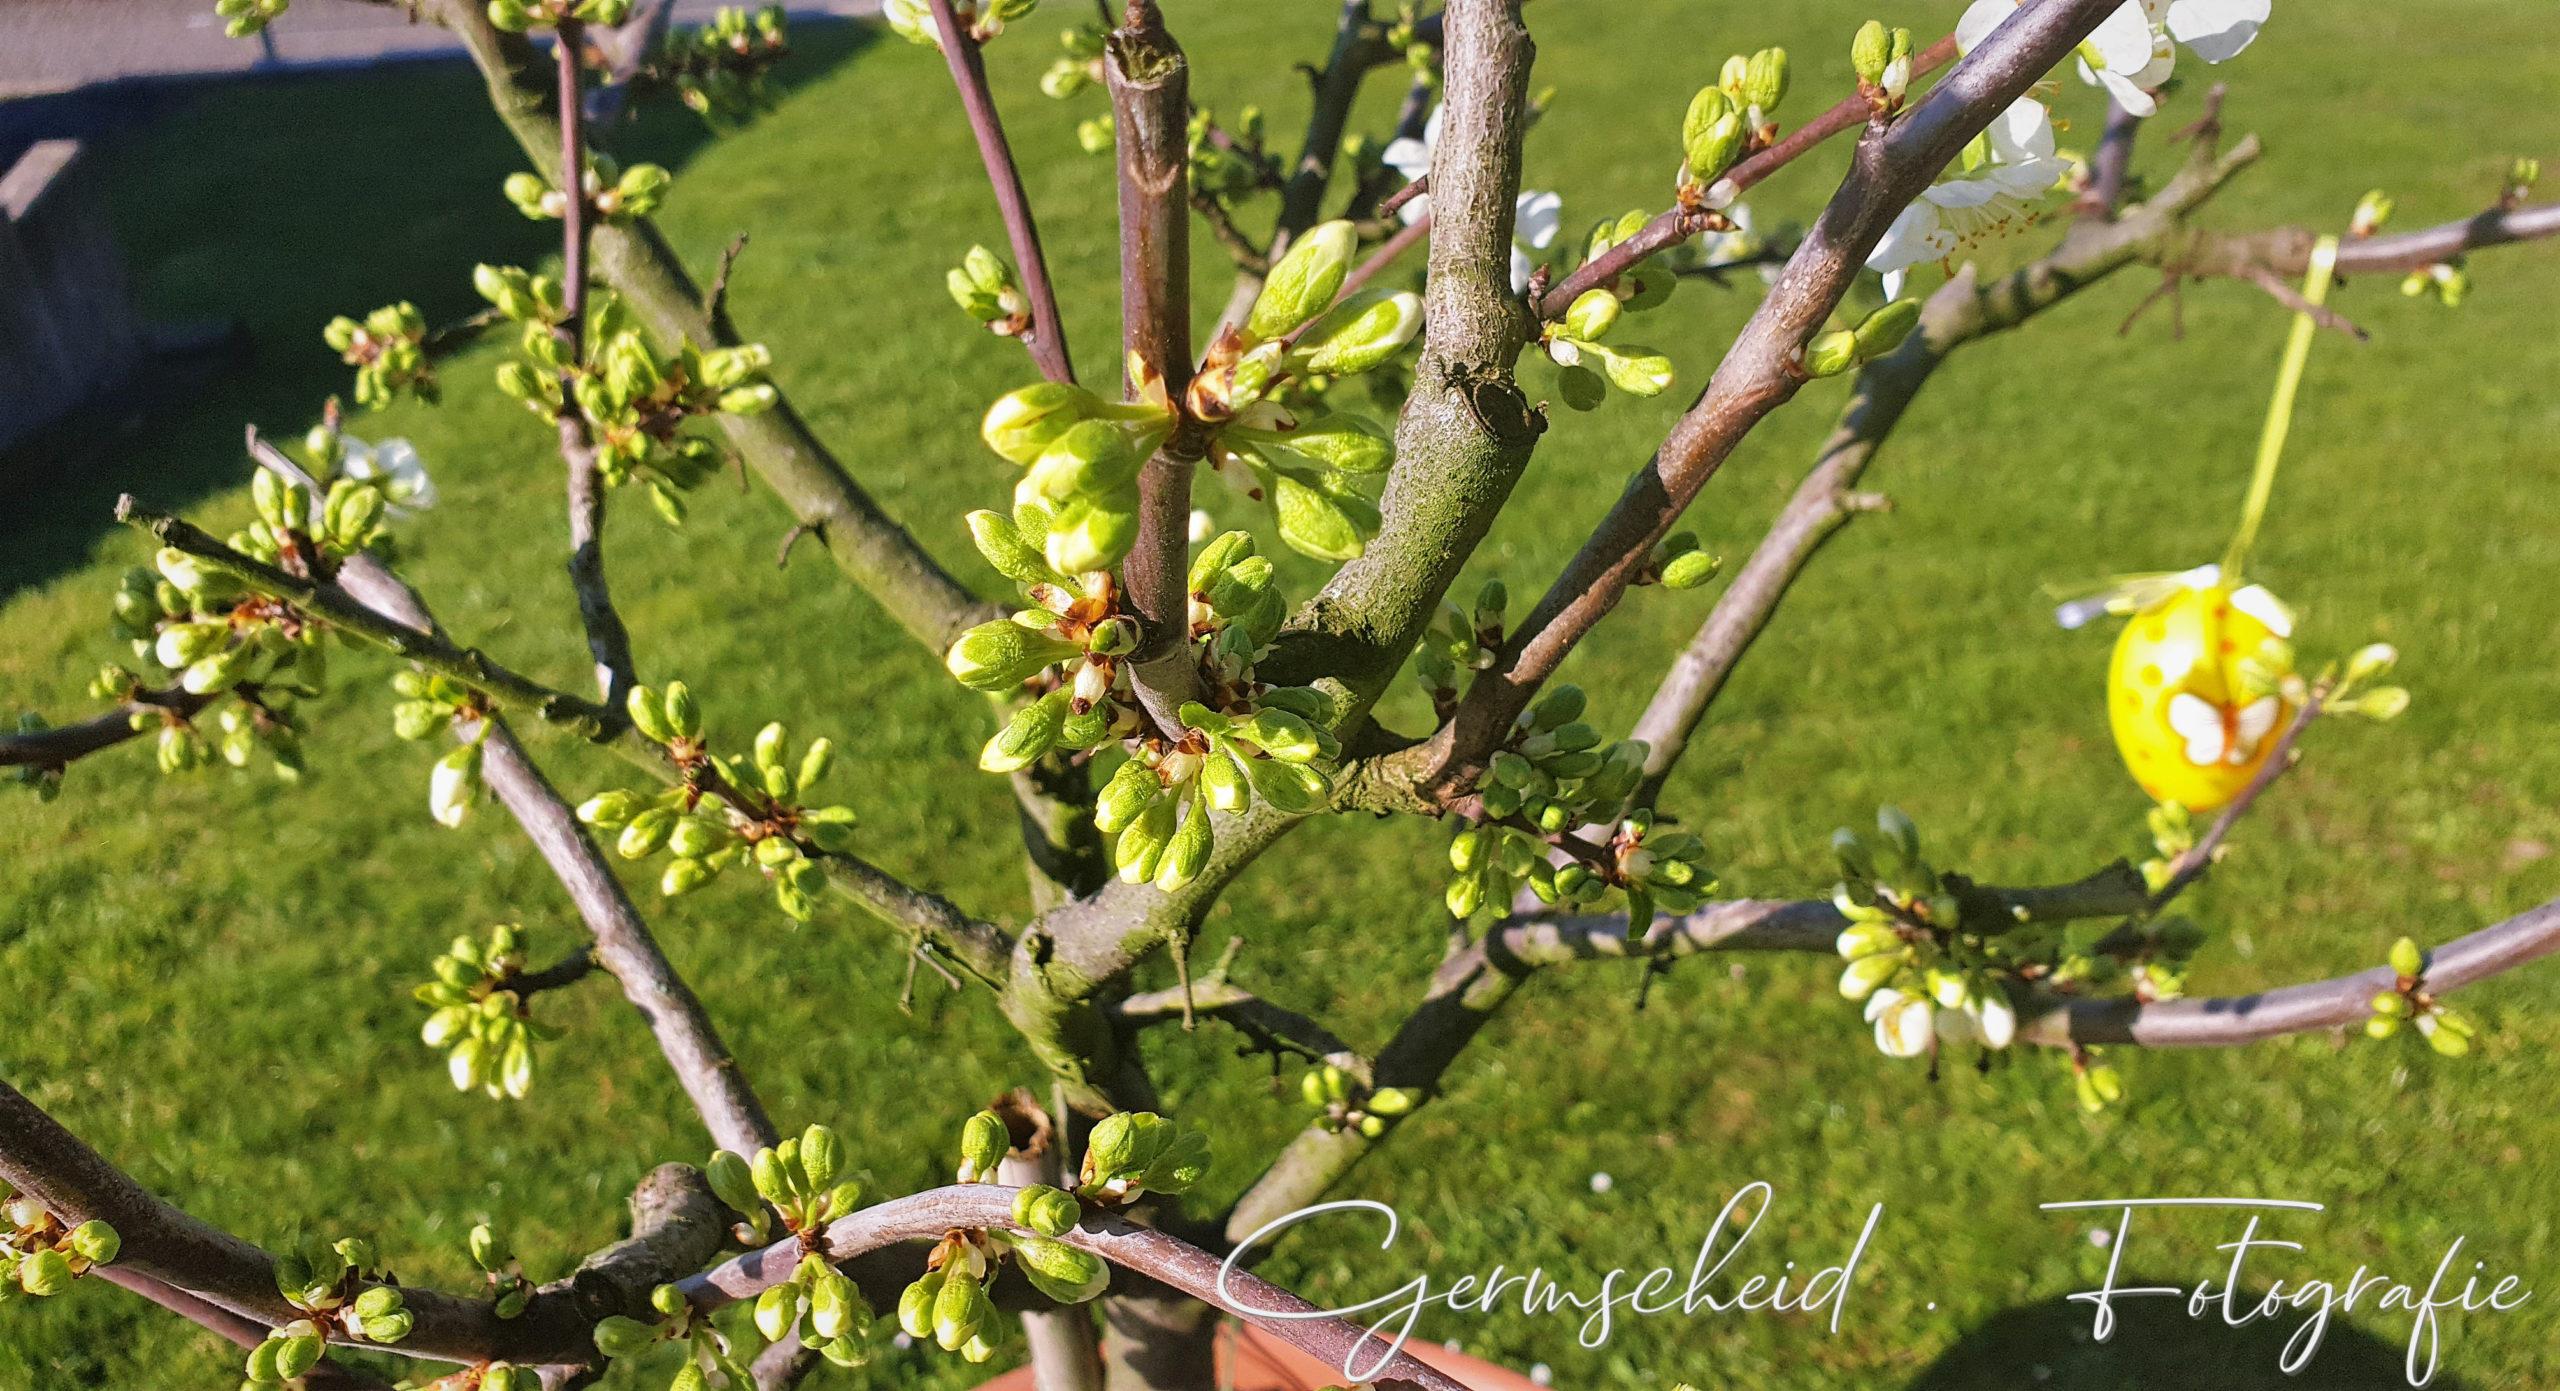 Pflaumenbaum am Morgen scaled